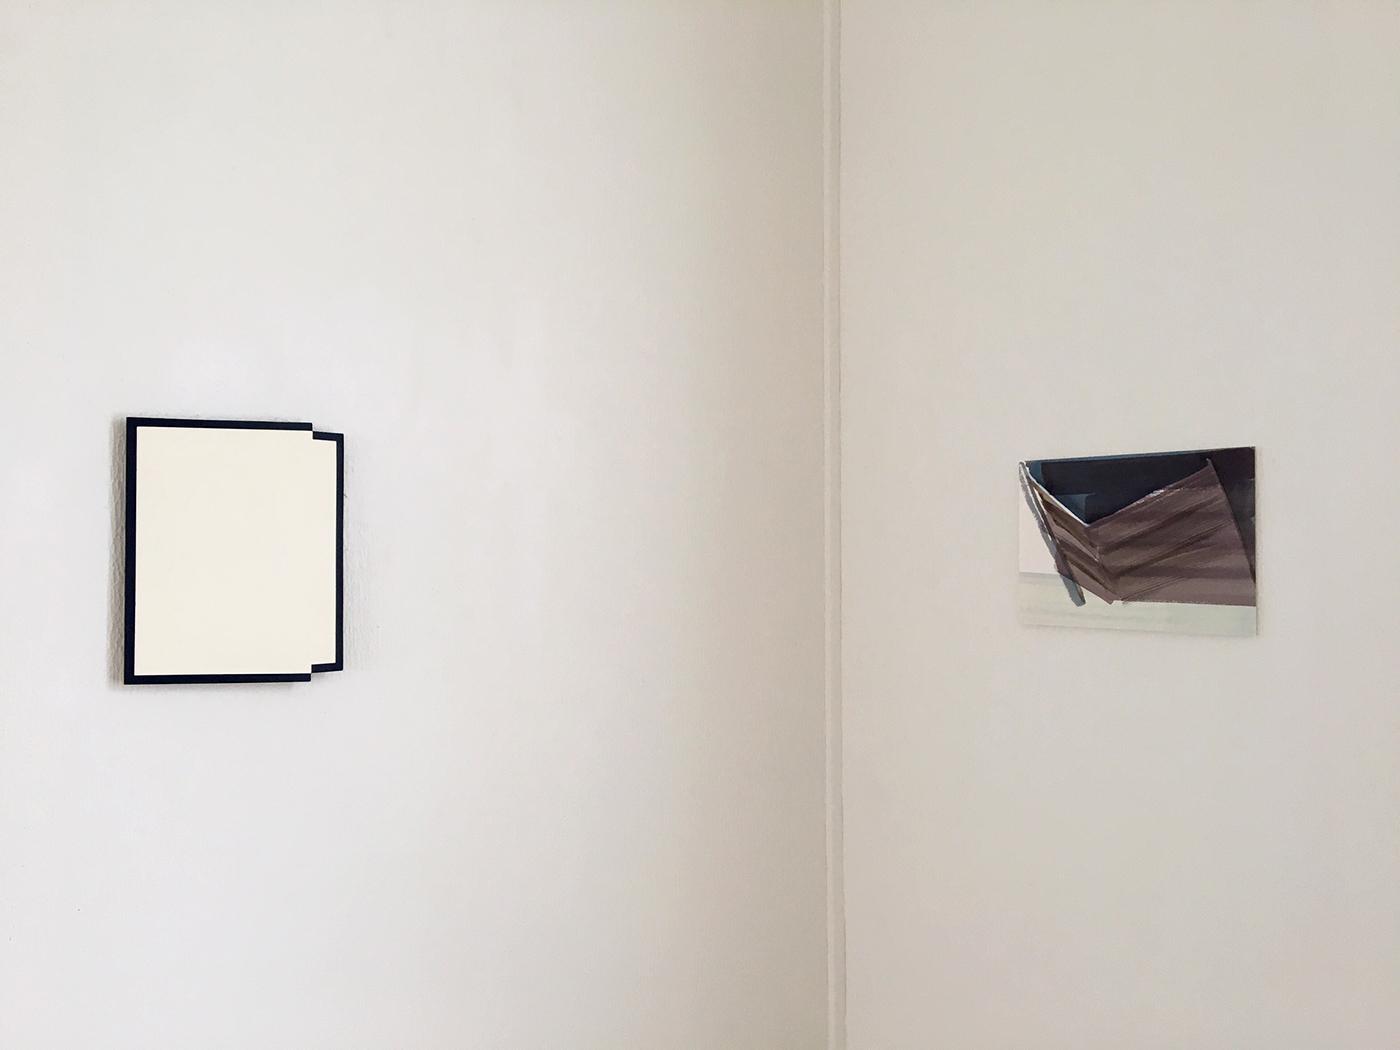 object Gerda Kruimer [left], watercolor Marena Seeling [right]